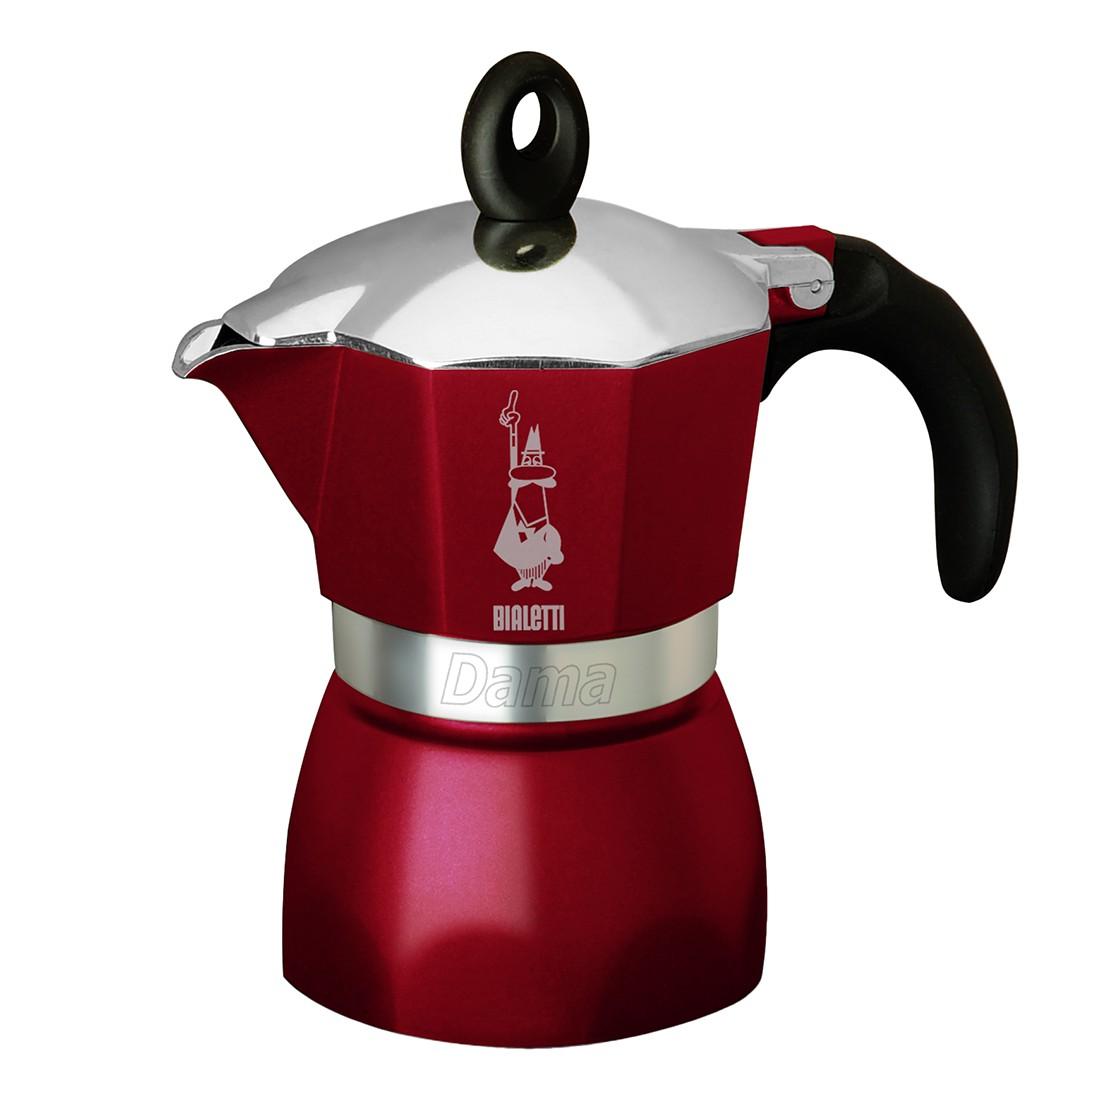 Espressokocher Dama Glamour – Bordeaux, 3 Tassen – Espressokocher Dama Glamour – bordeaux, 3 Tassen, Bialetti bestellen